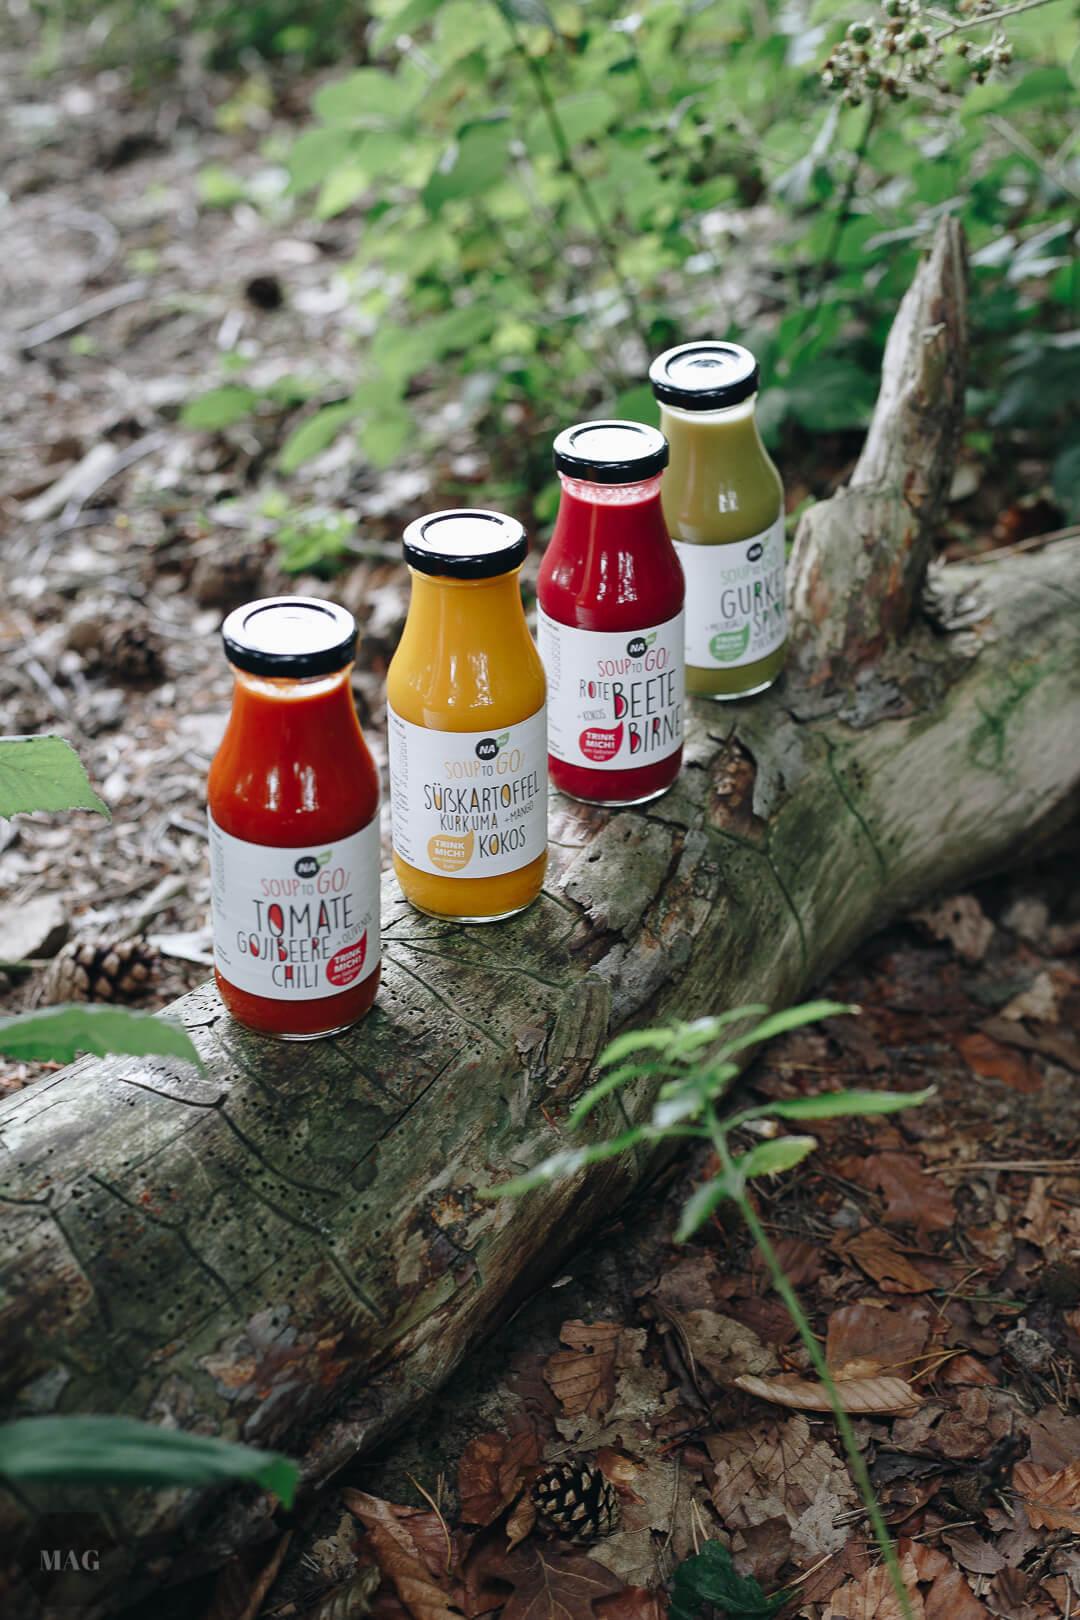 NAbio Suppen, NAbio to go, Suppen to go, NAbio, Suppen, vegane Suppen to go, Suppen bio to go, NAbio Suppen, NAbio Produkte, NAbio Suppen in Bioqualität